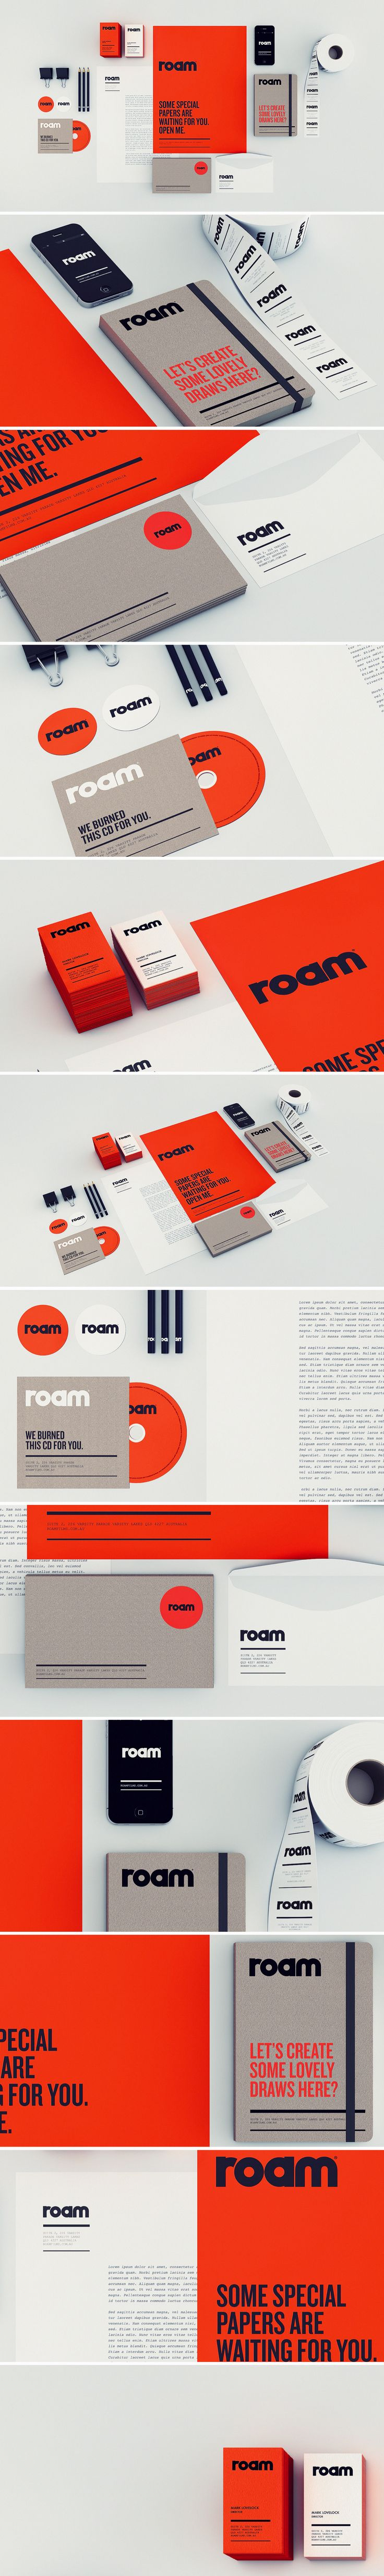 Roam identity